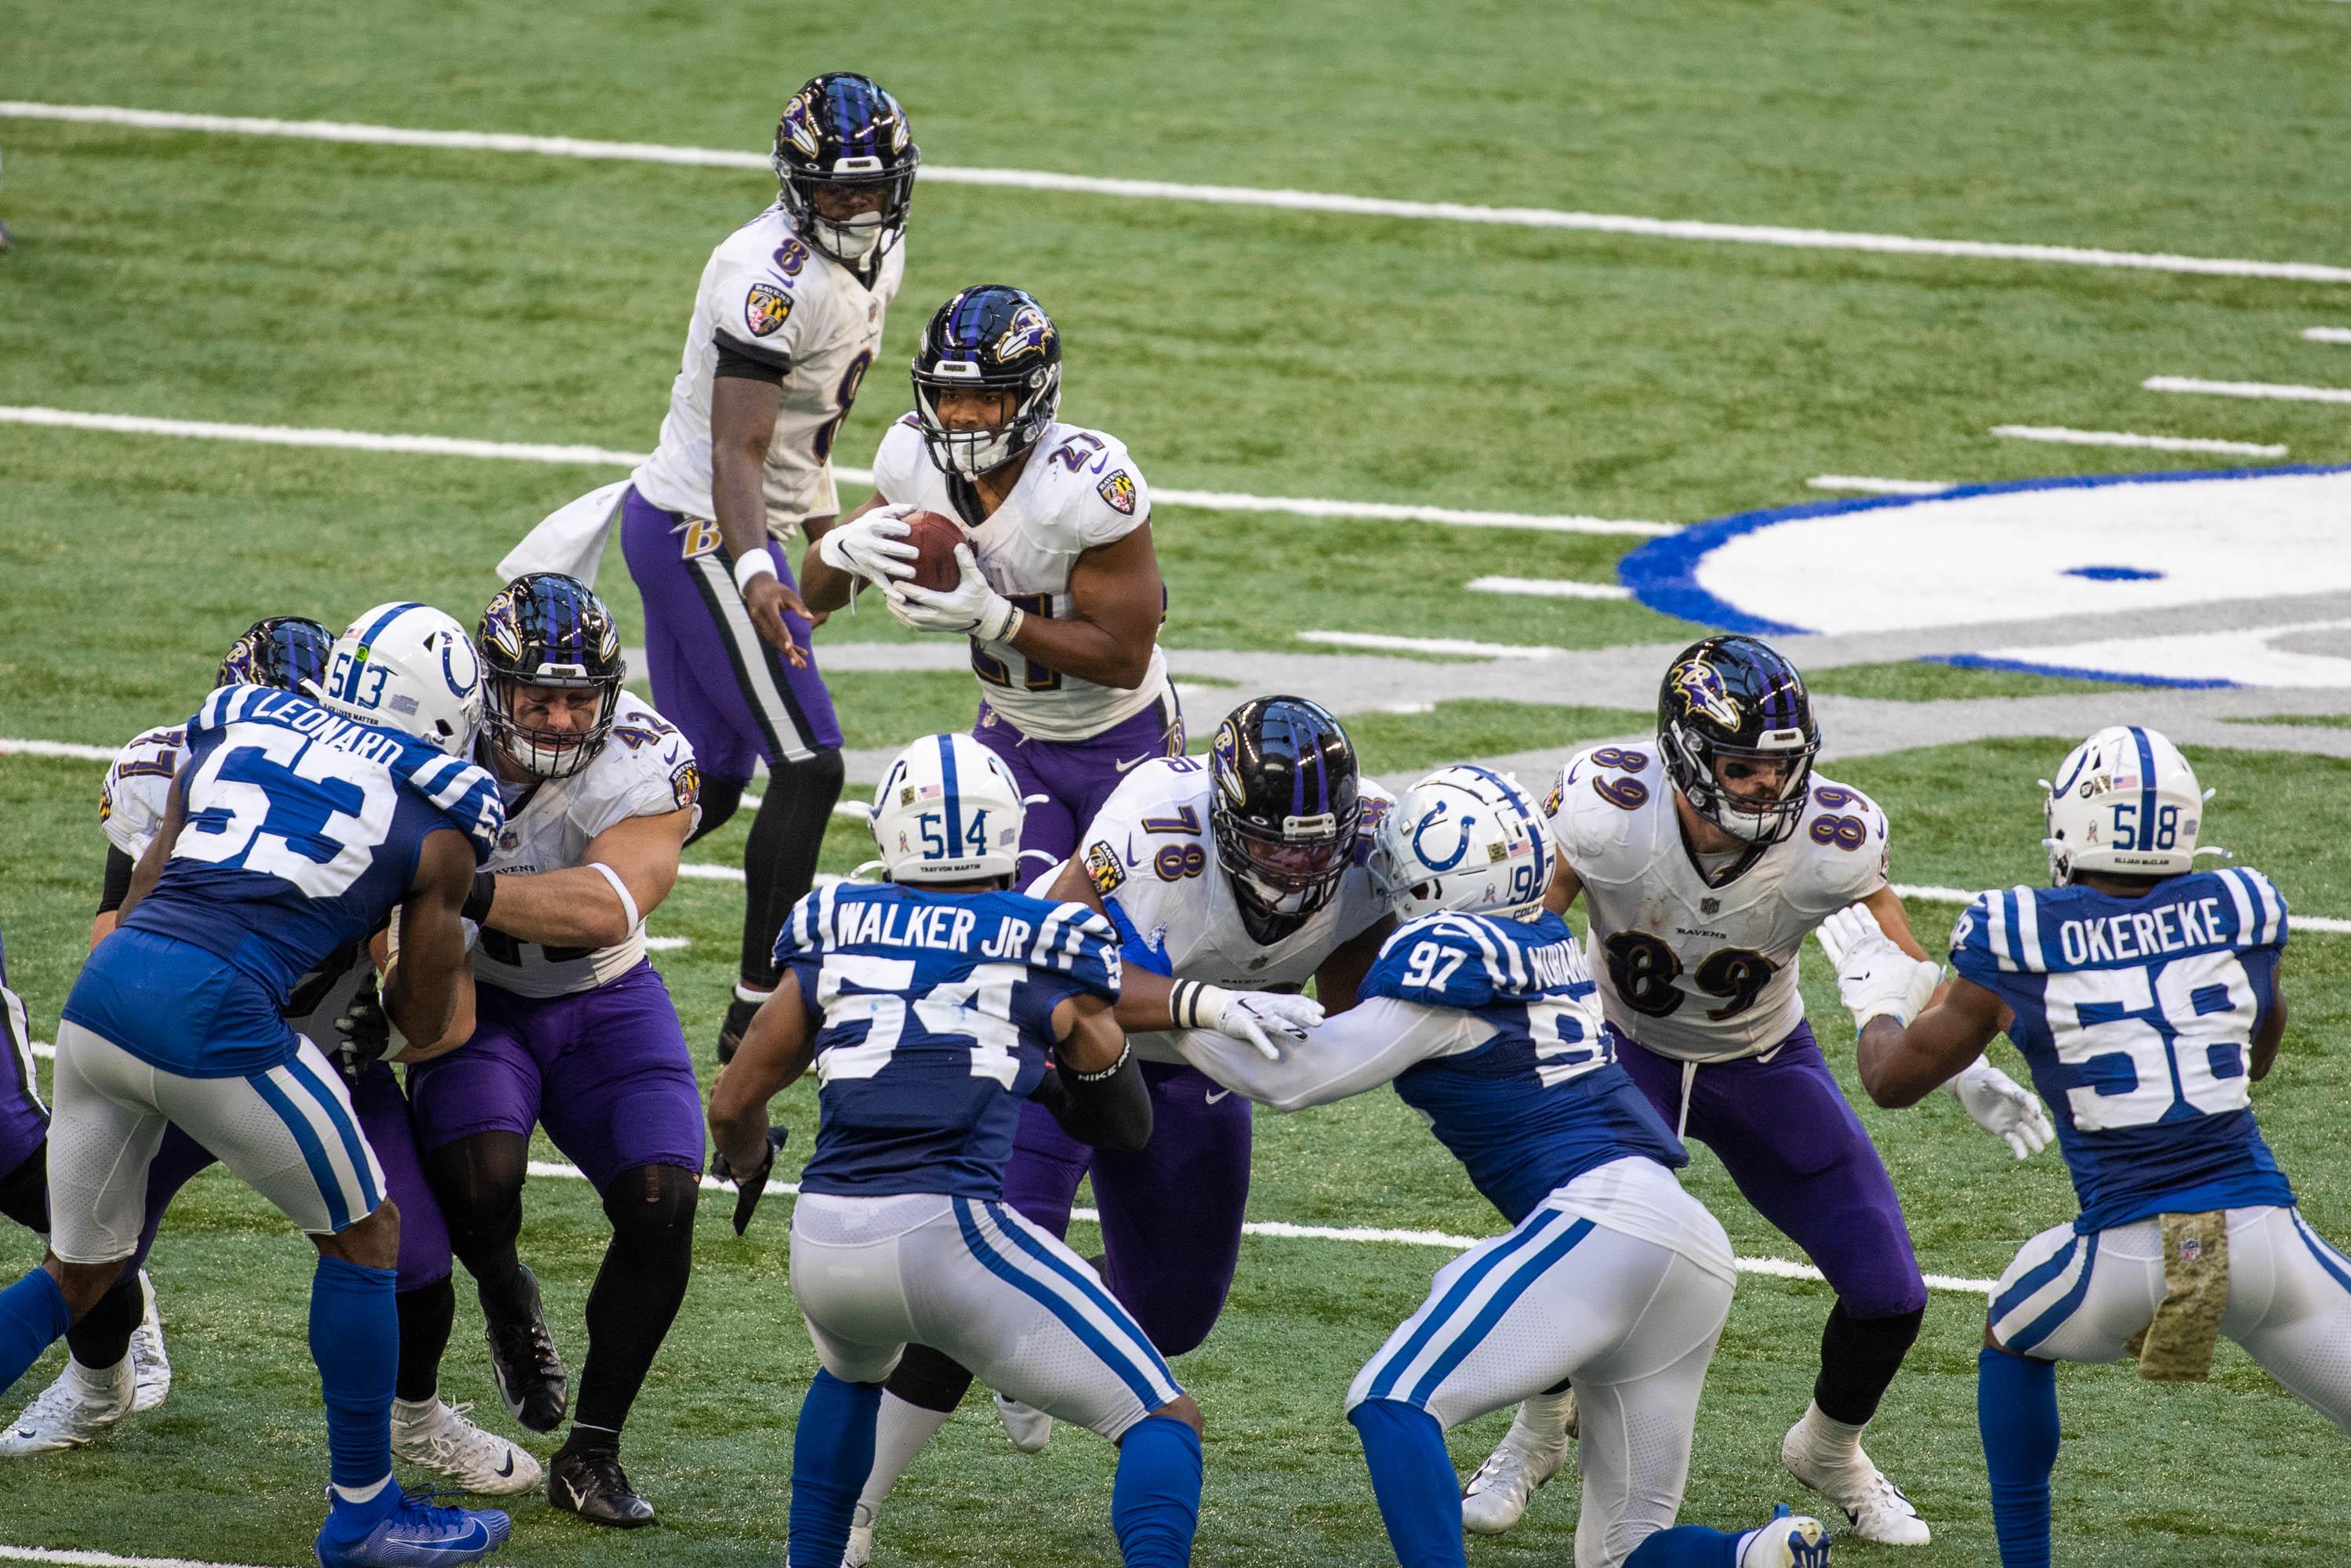 NFL: Baltimore Ravens at Indianapolis Colts